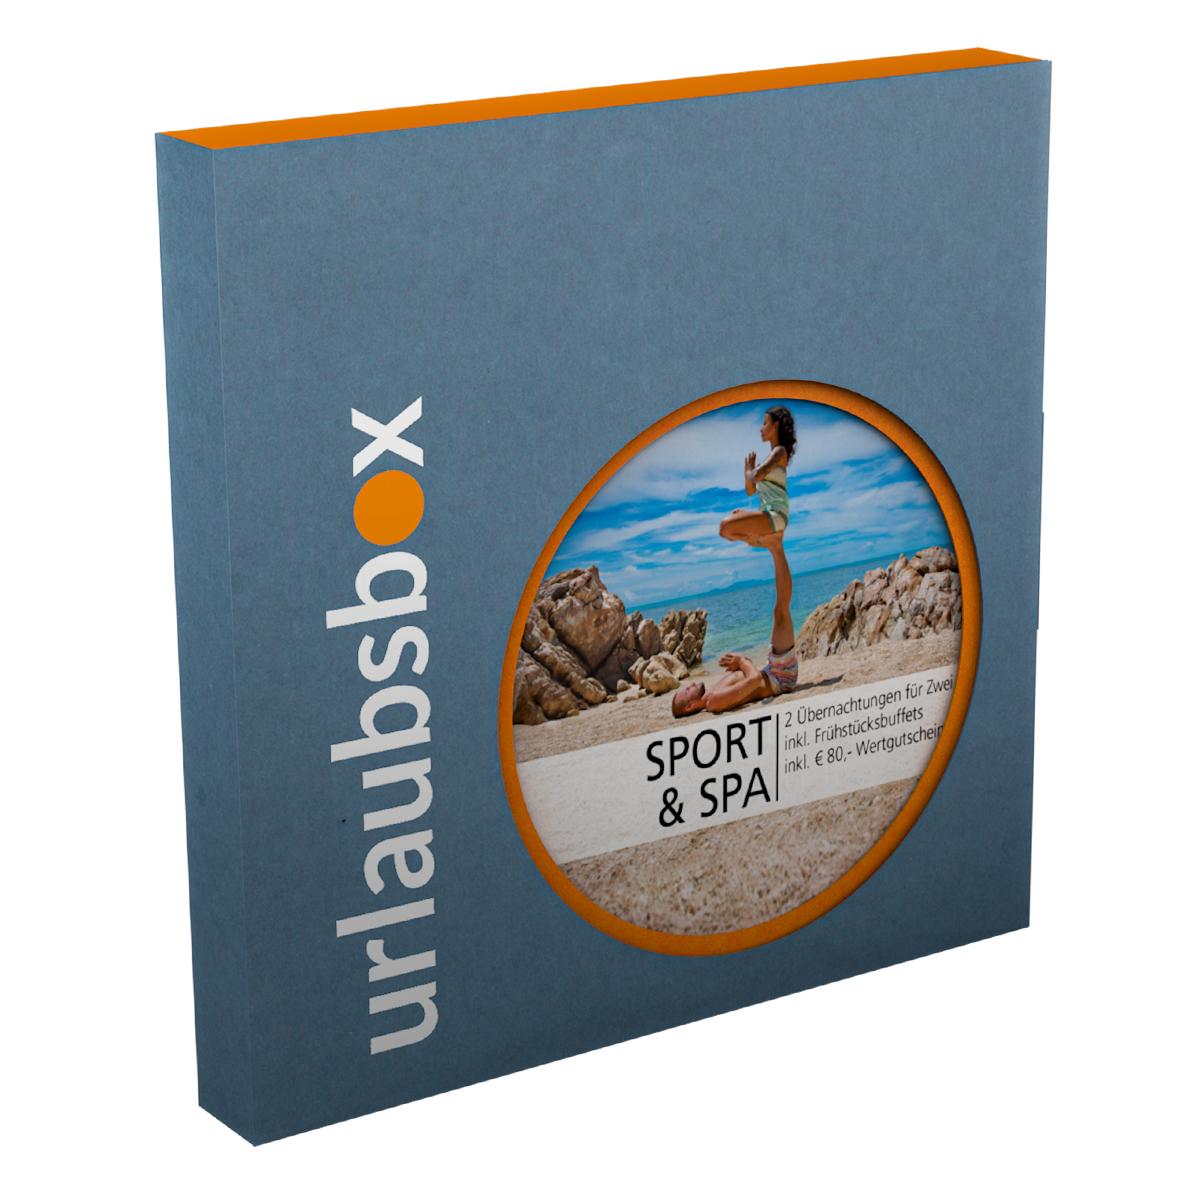 Sport & Spa - Hotelgutschein Deluxe - 2